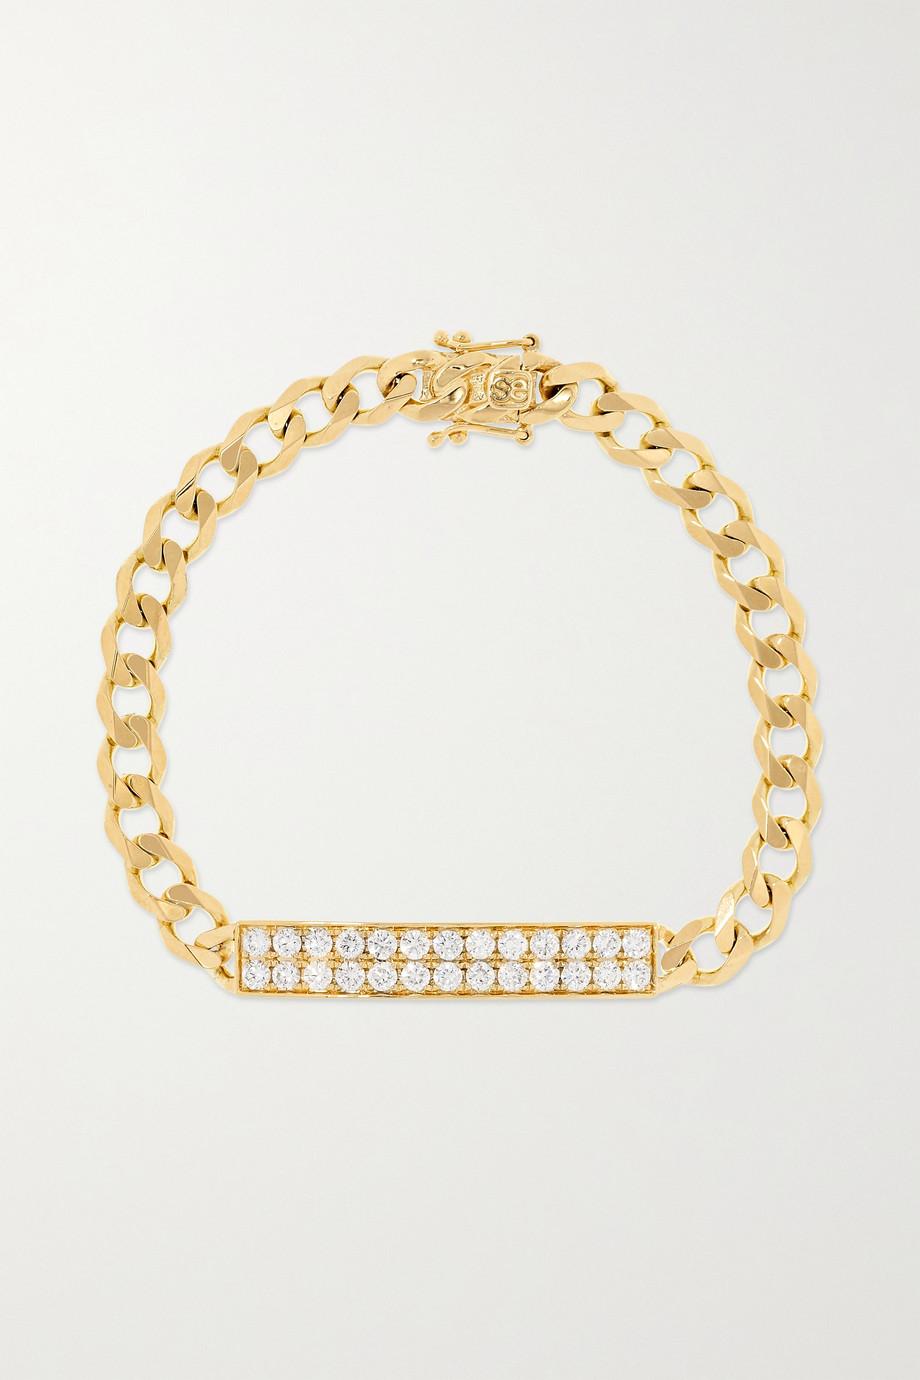 Sydney Evan Bracelet en or 14 carats et diamants ID Bar